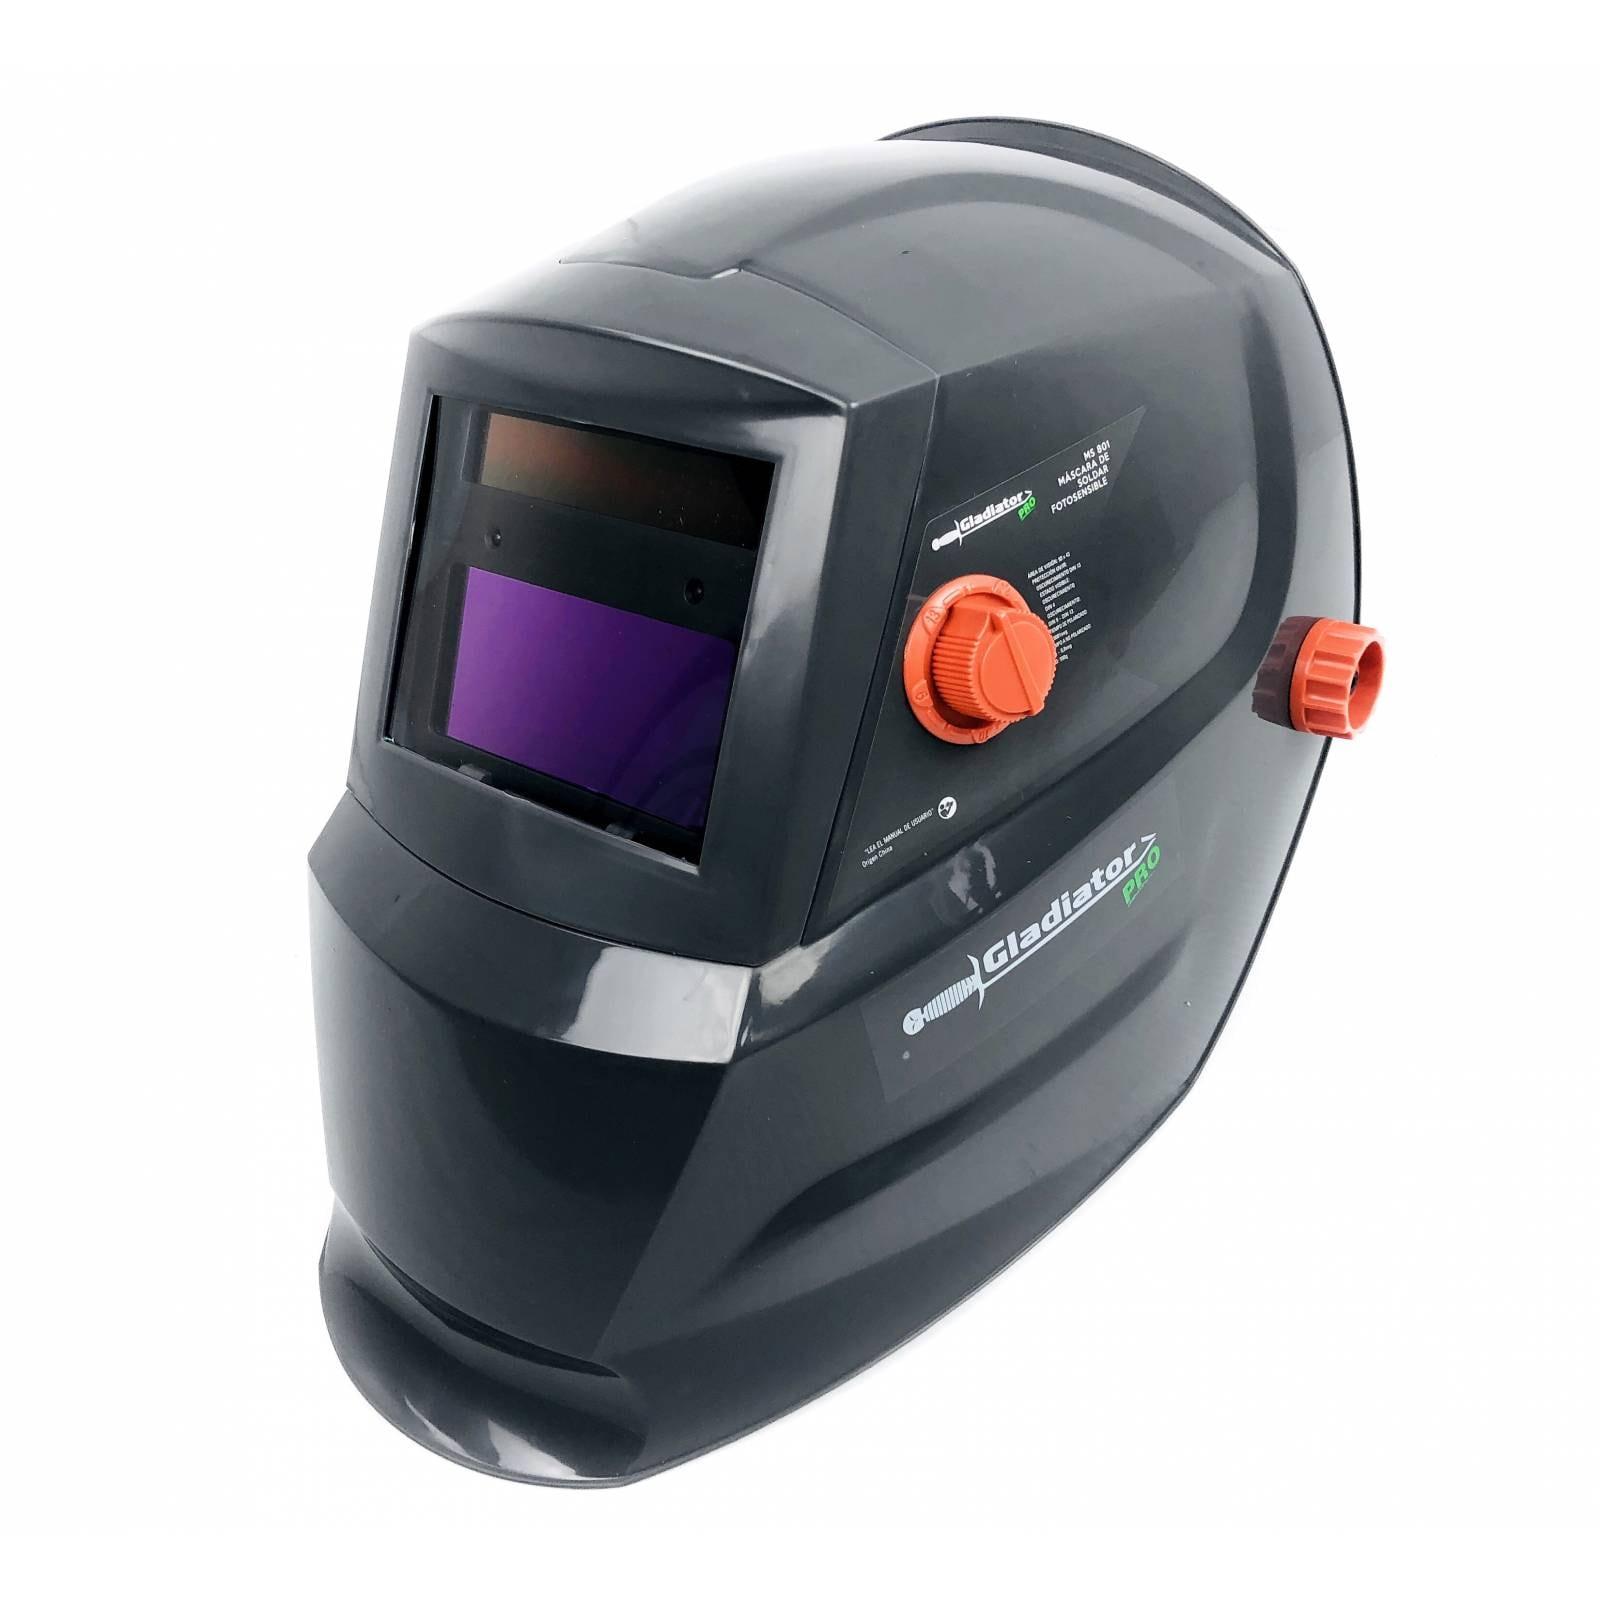 Careta Para Soldar Fotosensible GLADIADOR Ms801 93x43